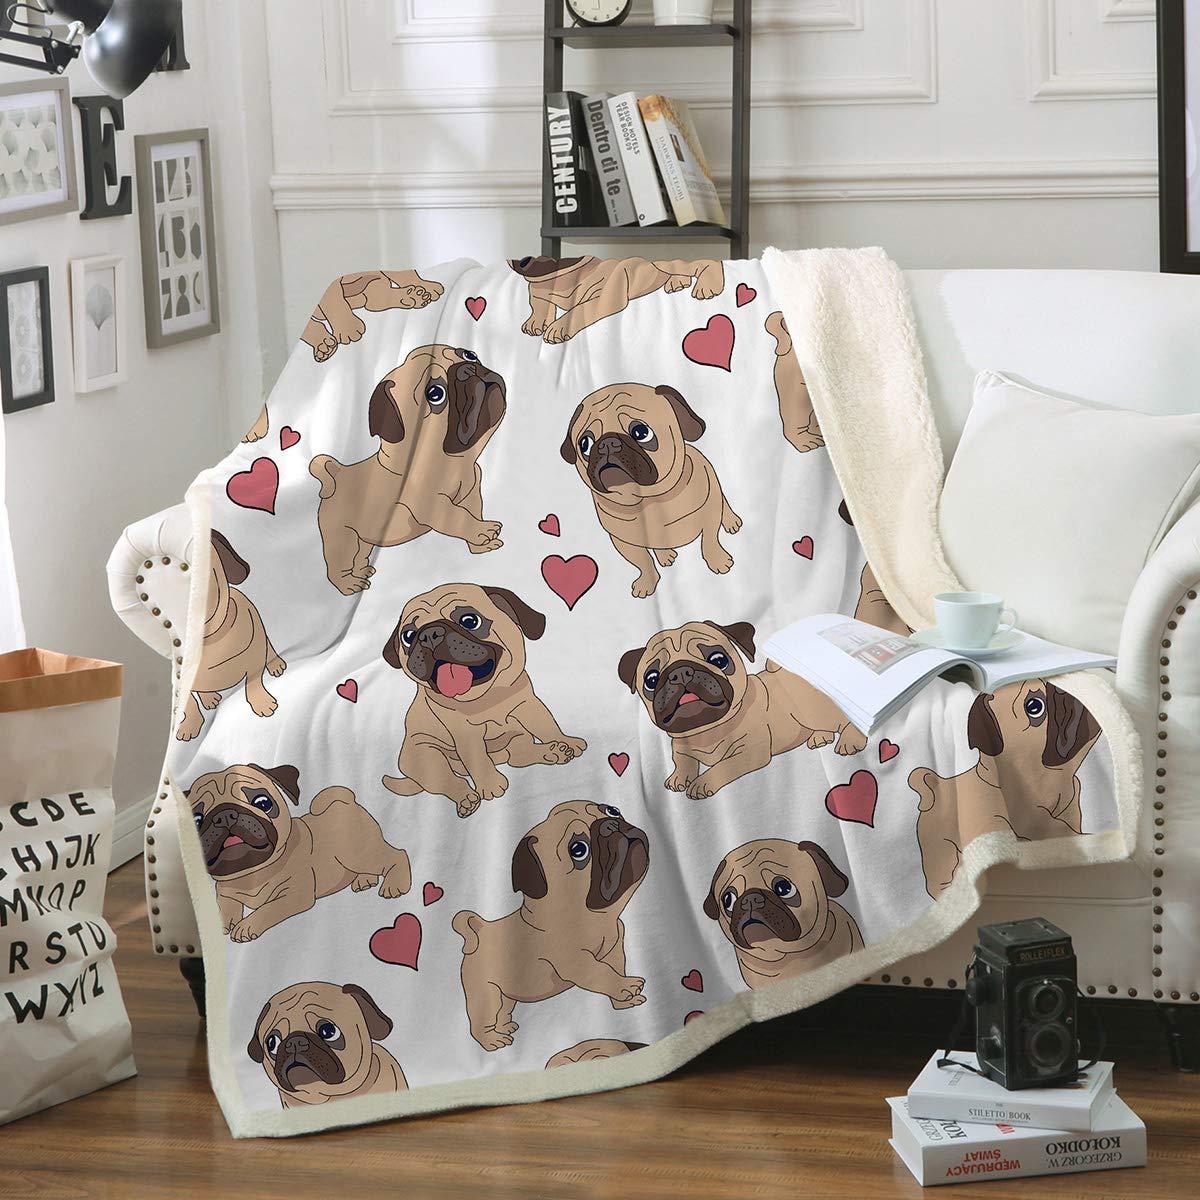 Sleepwish Pug Fleece Blanket Pet Blanket Dog Reversible Blanket Soft Sherpa Blanket Throw Blanket Pug Lover (50''x 60'')